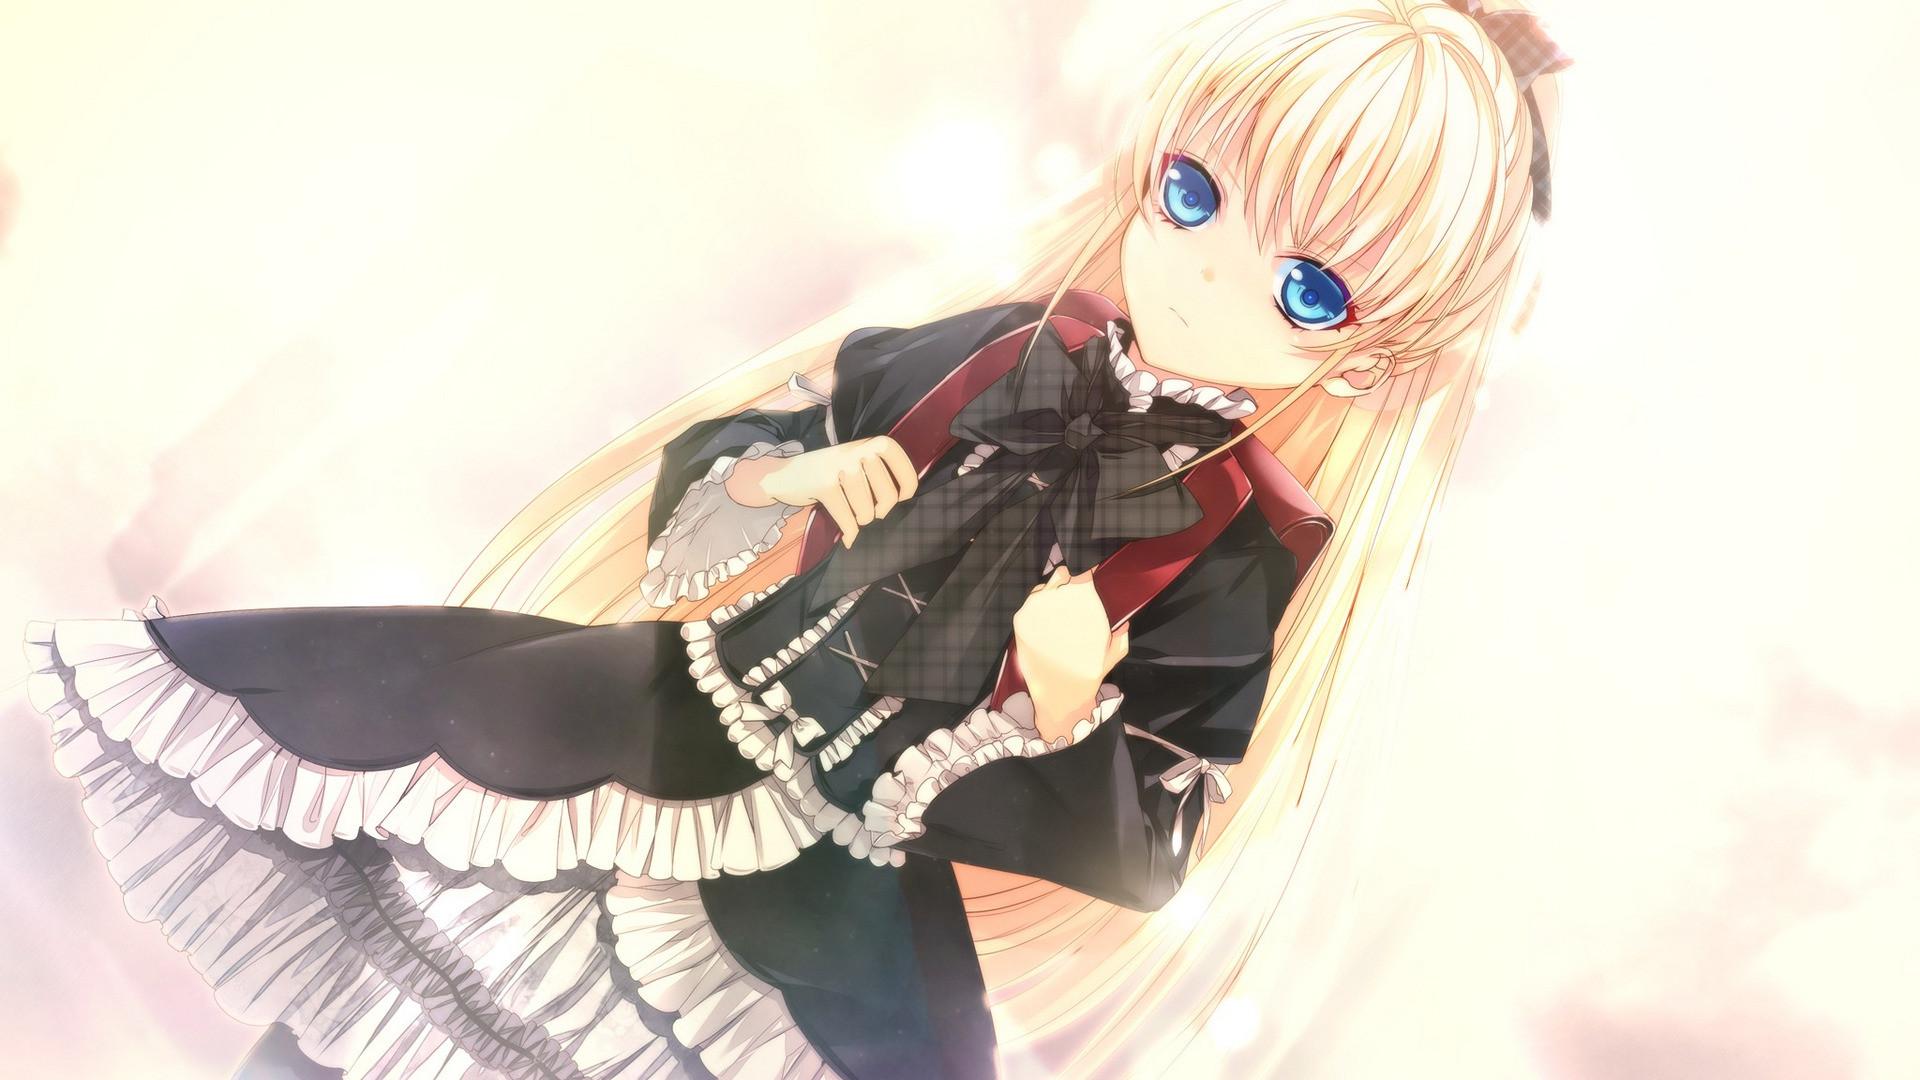 Res: 1920x1080, Anime - Negai no Kakera to Hakugin no Agreement Long Hair School Uniform  Skirt Blonde Ponytail